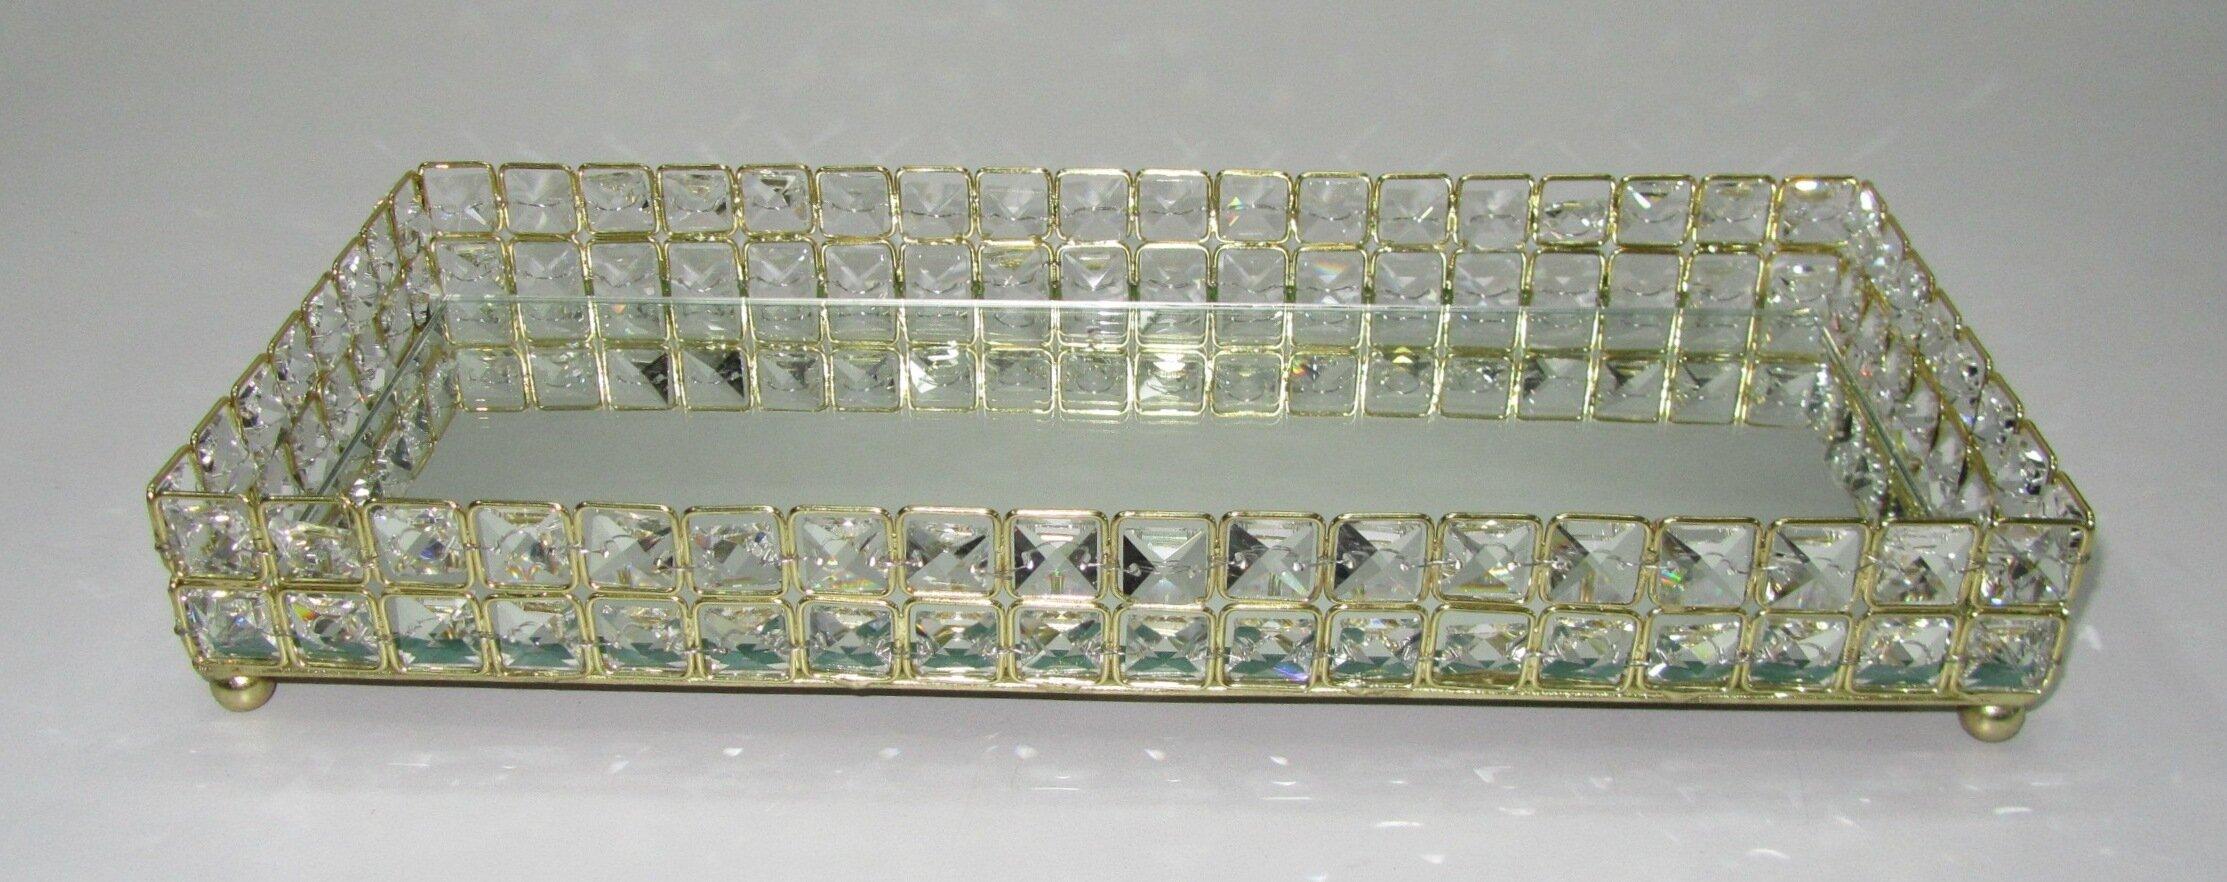 ebay footed crystal tray holder w vanity en lion gold claw buy us dresser brass gilt depression